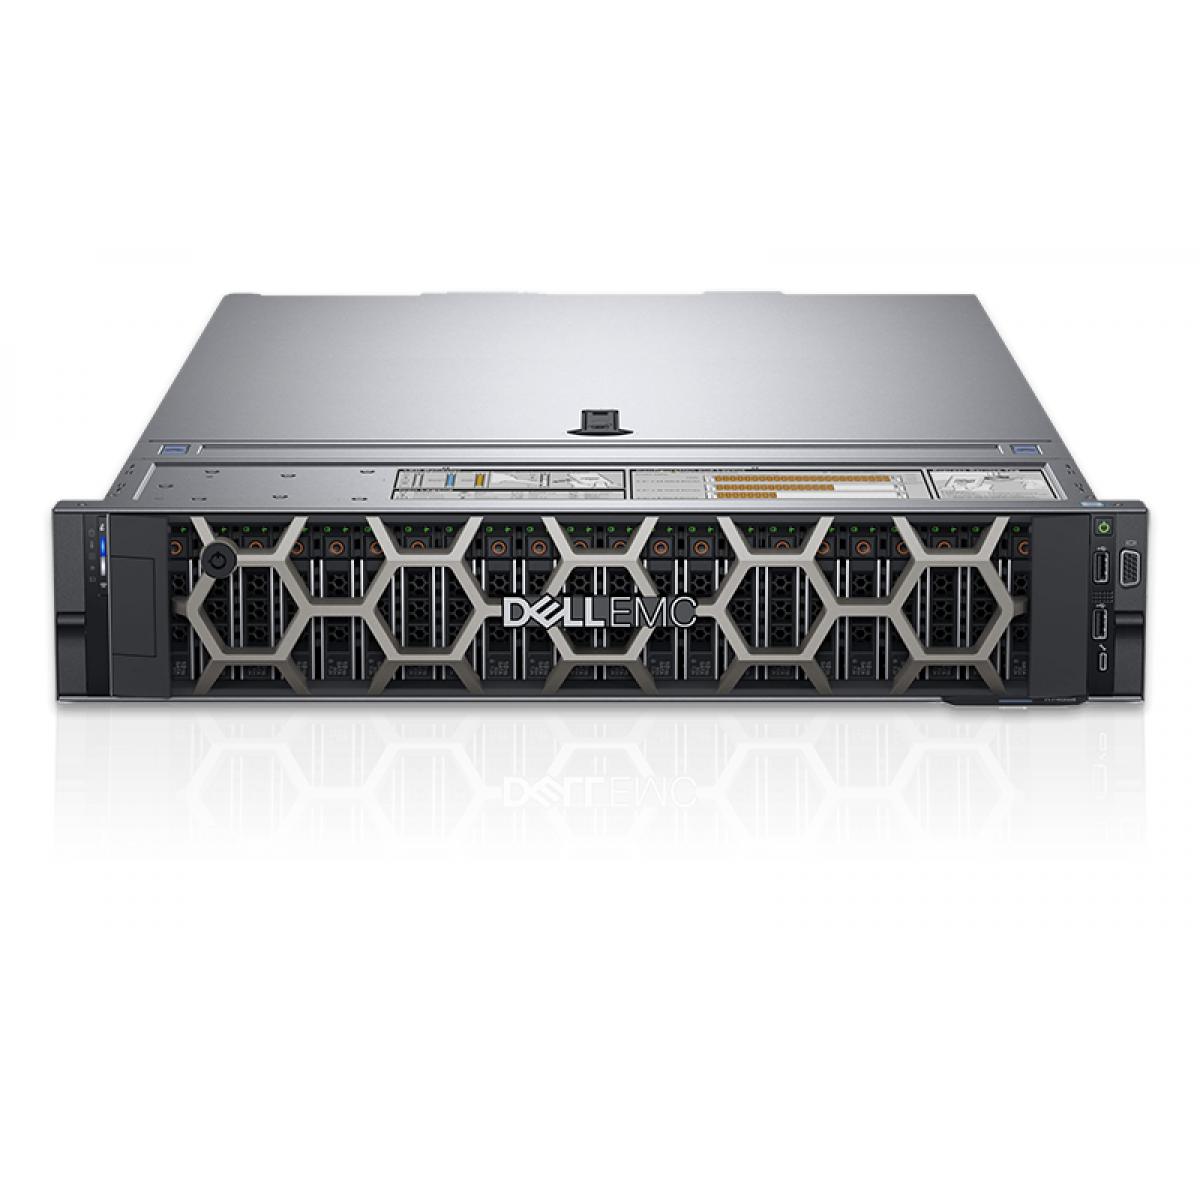 Server Dell PowerEdge R740 - Xeon 4110 Silver 8GB